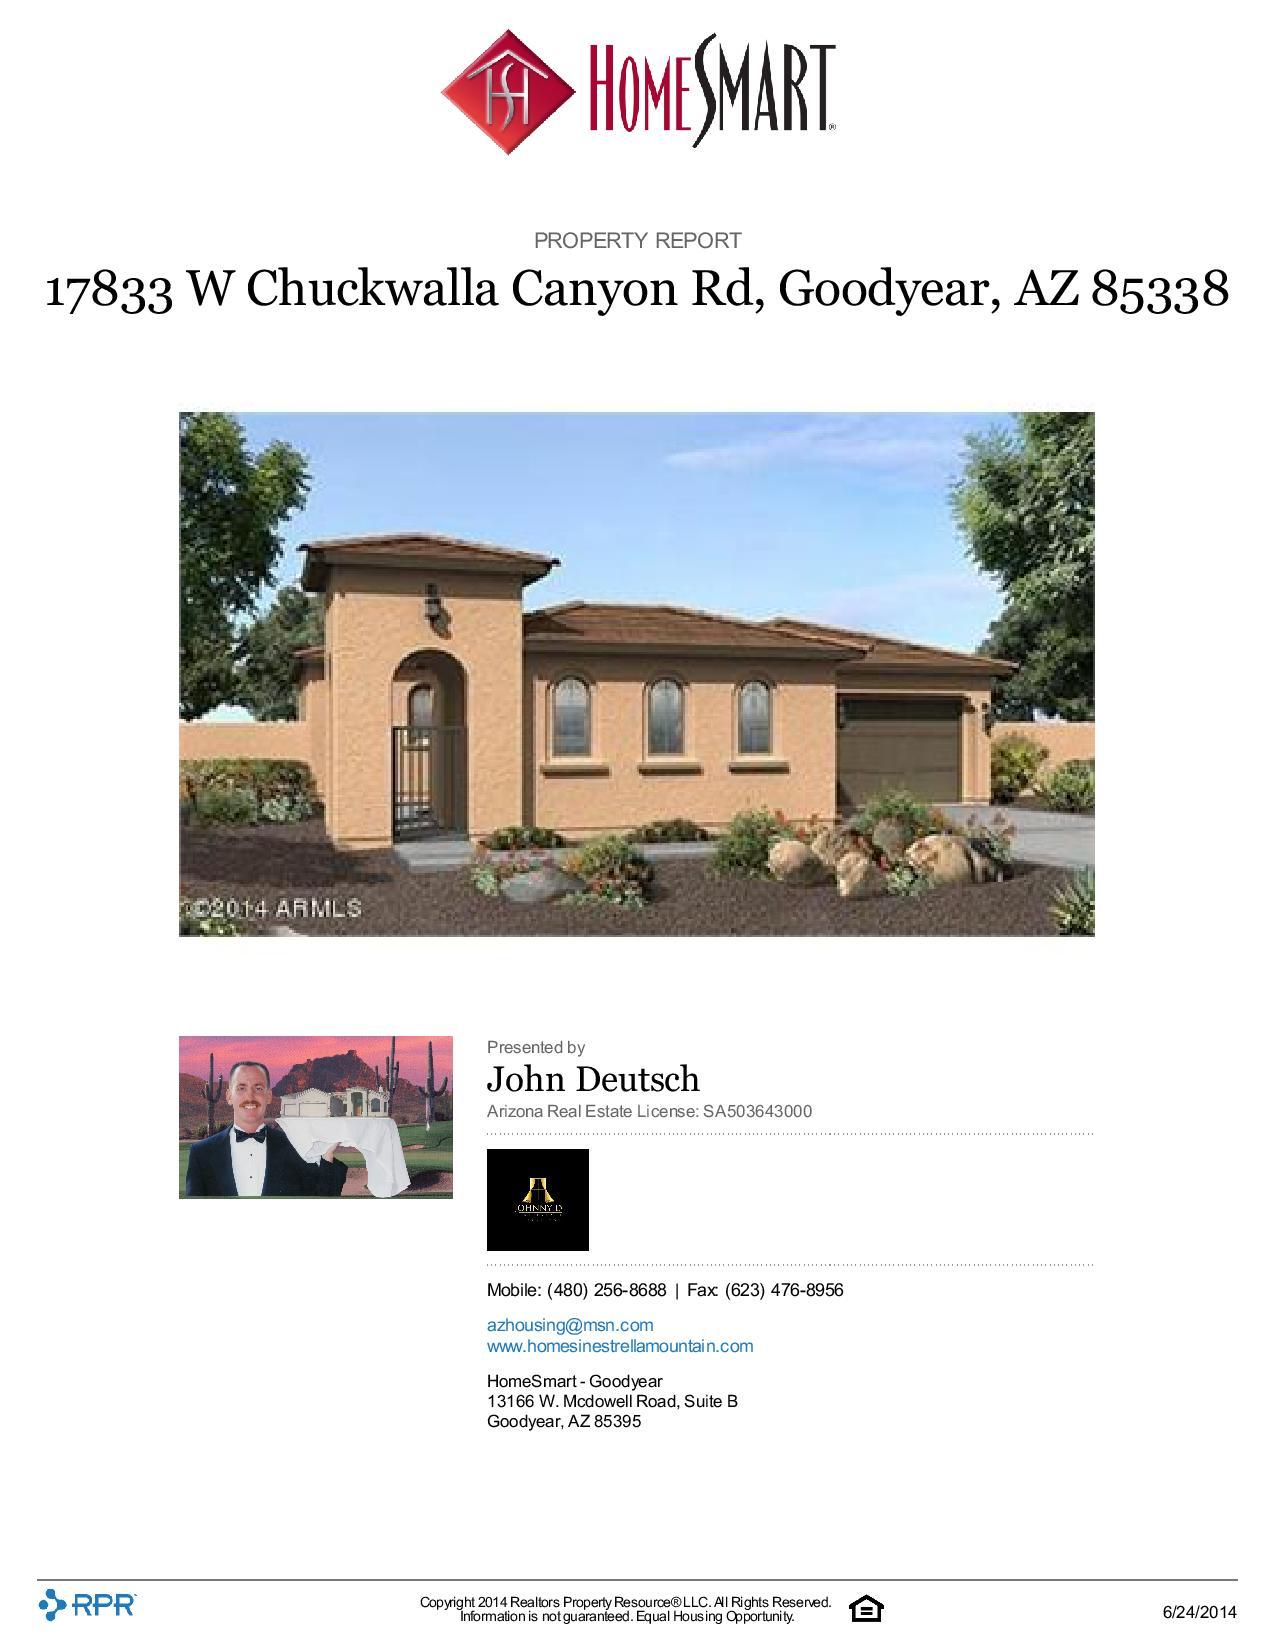 17833-W-Chuckwalla-Canyon-Rd-Goodyear-AZ-85338-page-001